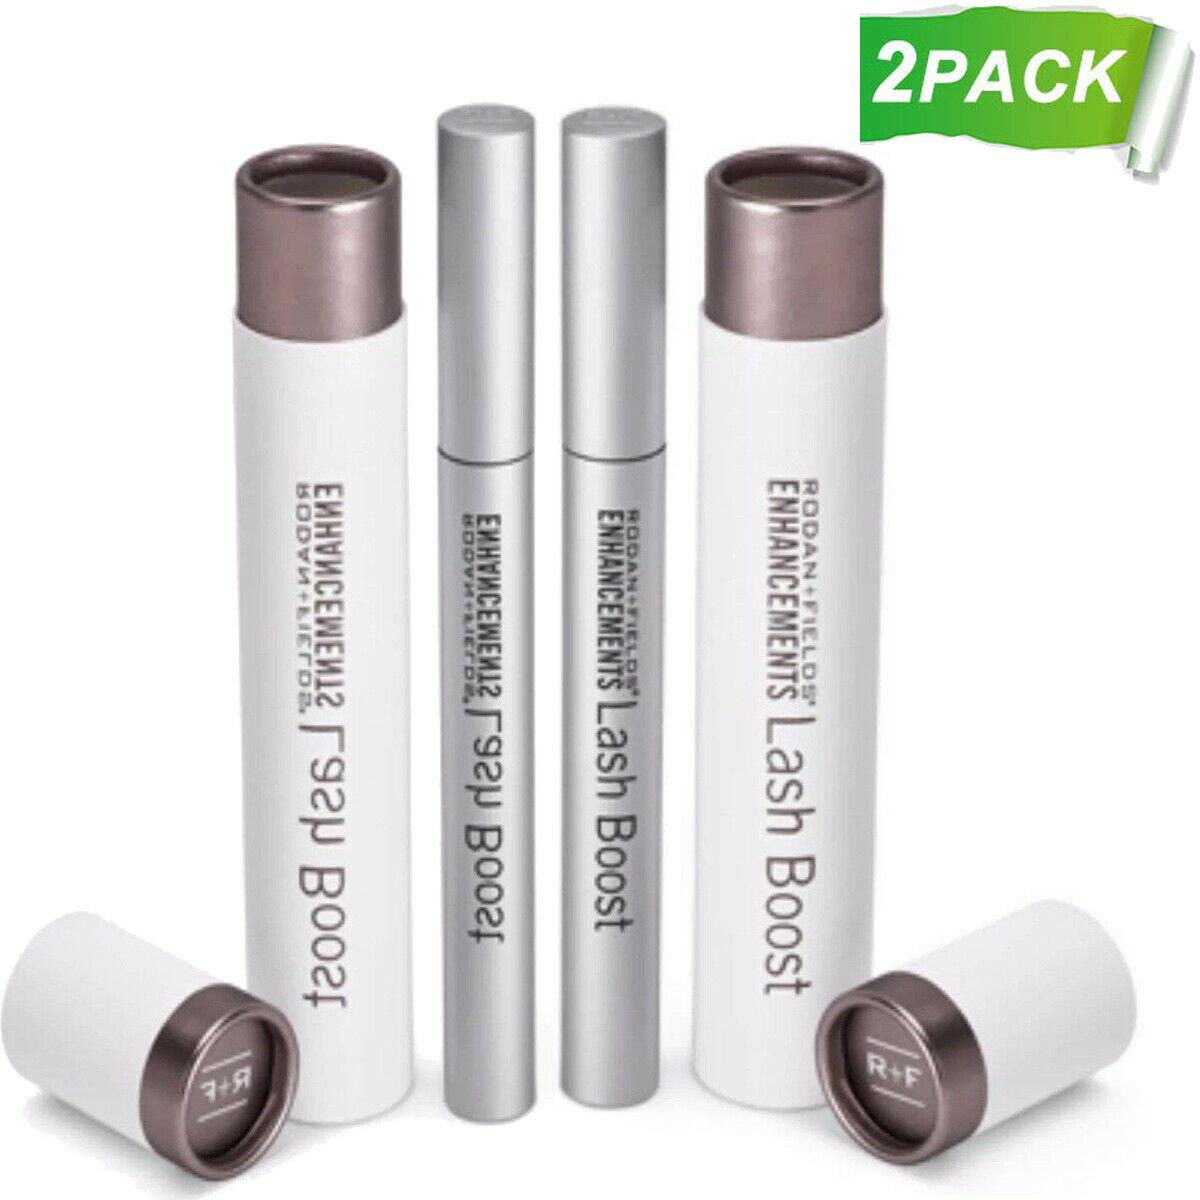 SEALED Rodan & and Fields Enhancements Lash Boost Eyelash Serum(5 ml/USA) 2 PACK 1